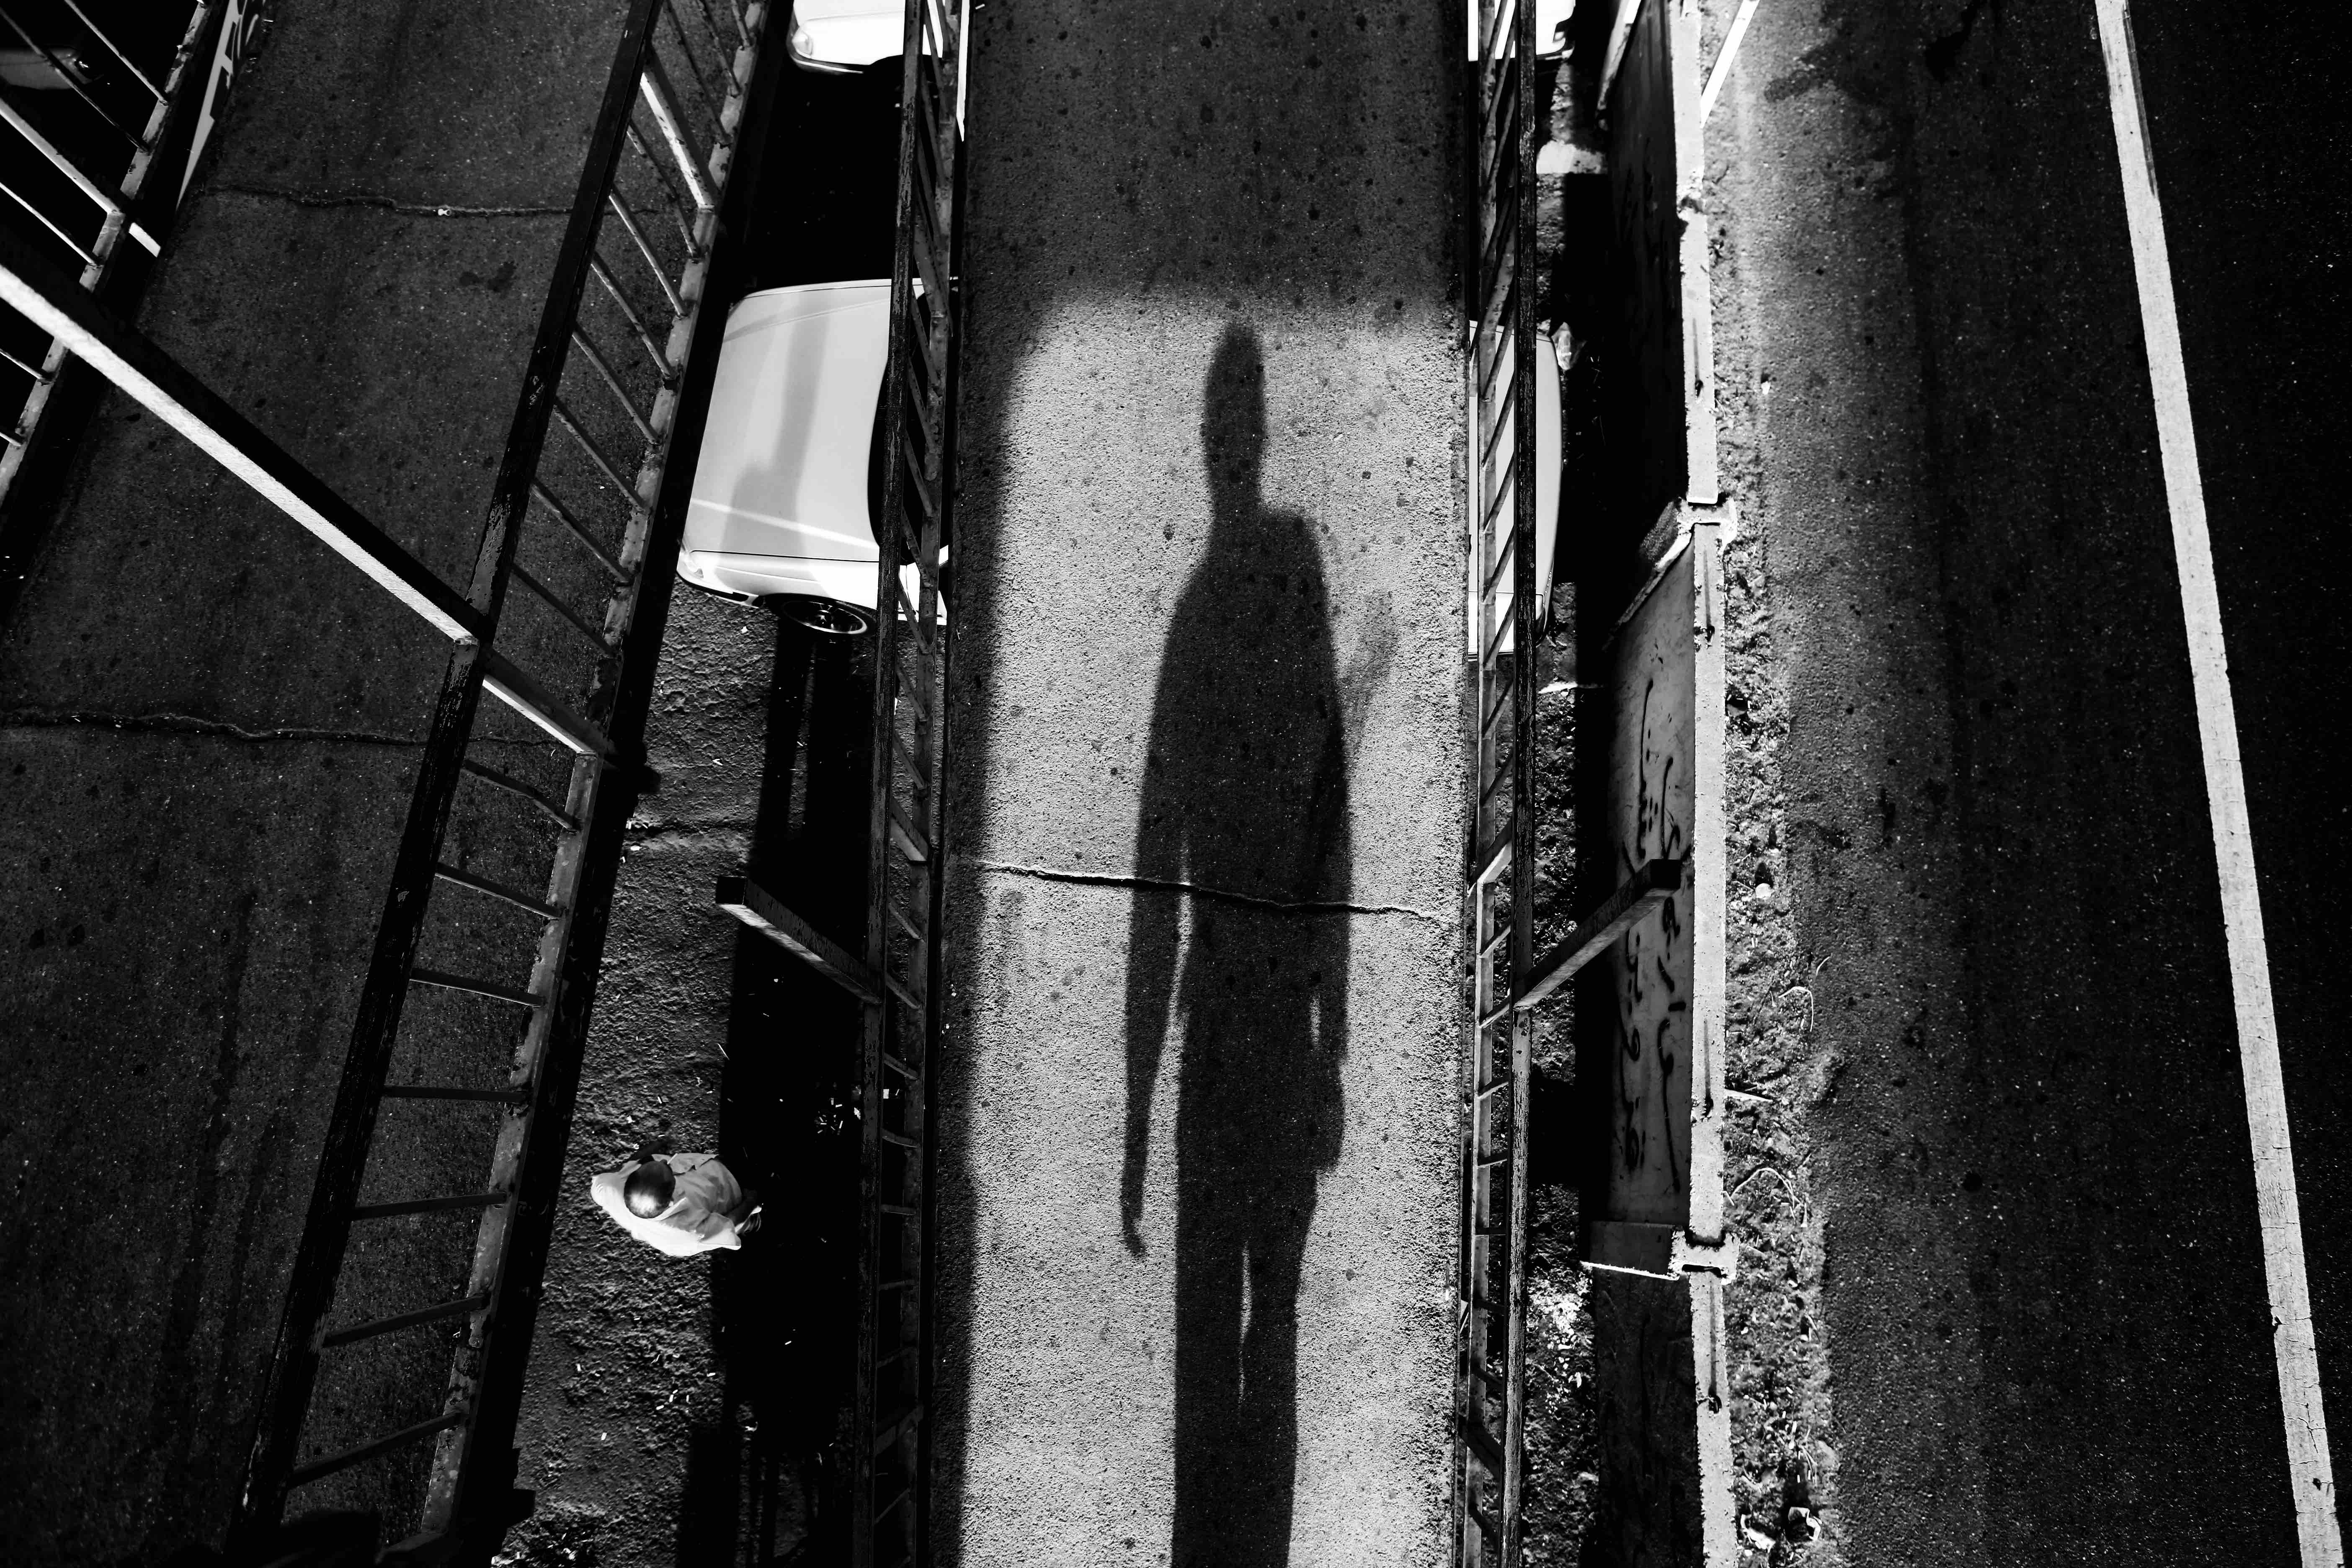 Untitled (8)_ The Life Of Shadows Series - Nehdaran_ Dana